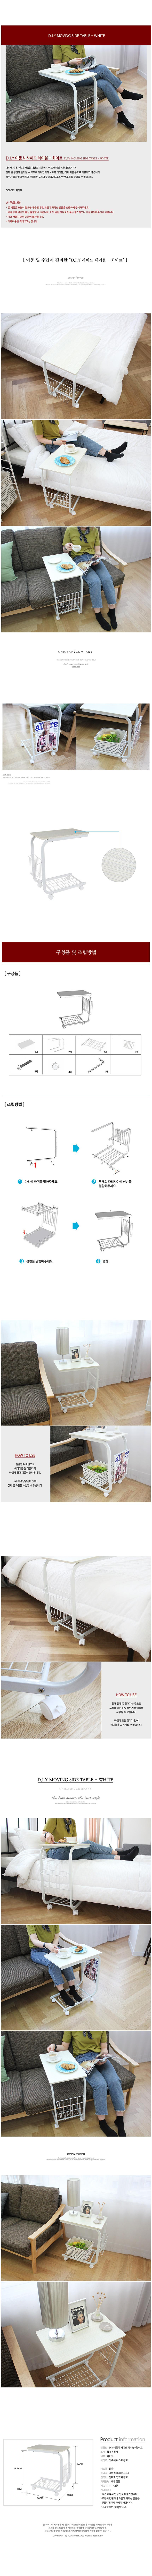 DIY 이동식 사이드 테이블-화이트 - 제이컴퍼니, 47,000원, DIY 책상/의자, DIY 책상/테이블